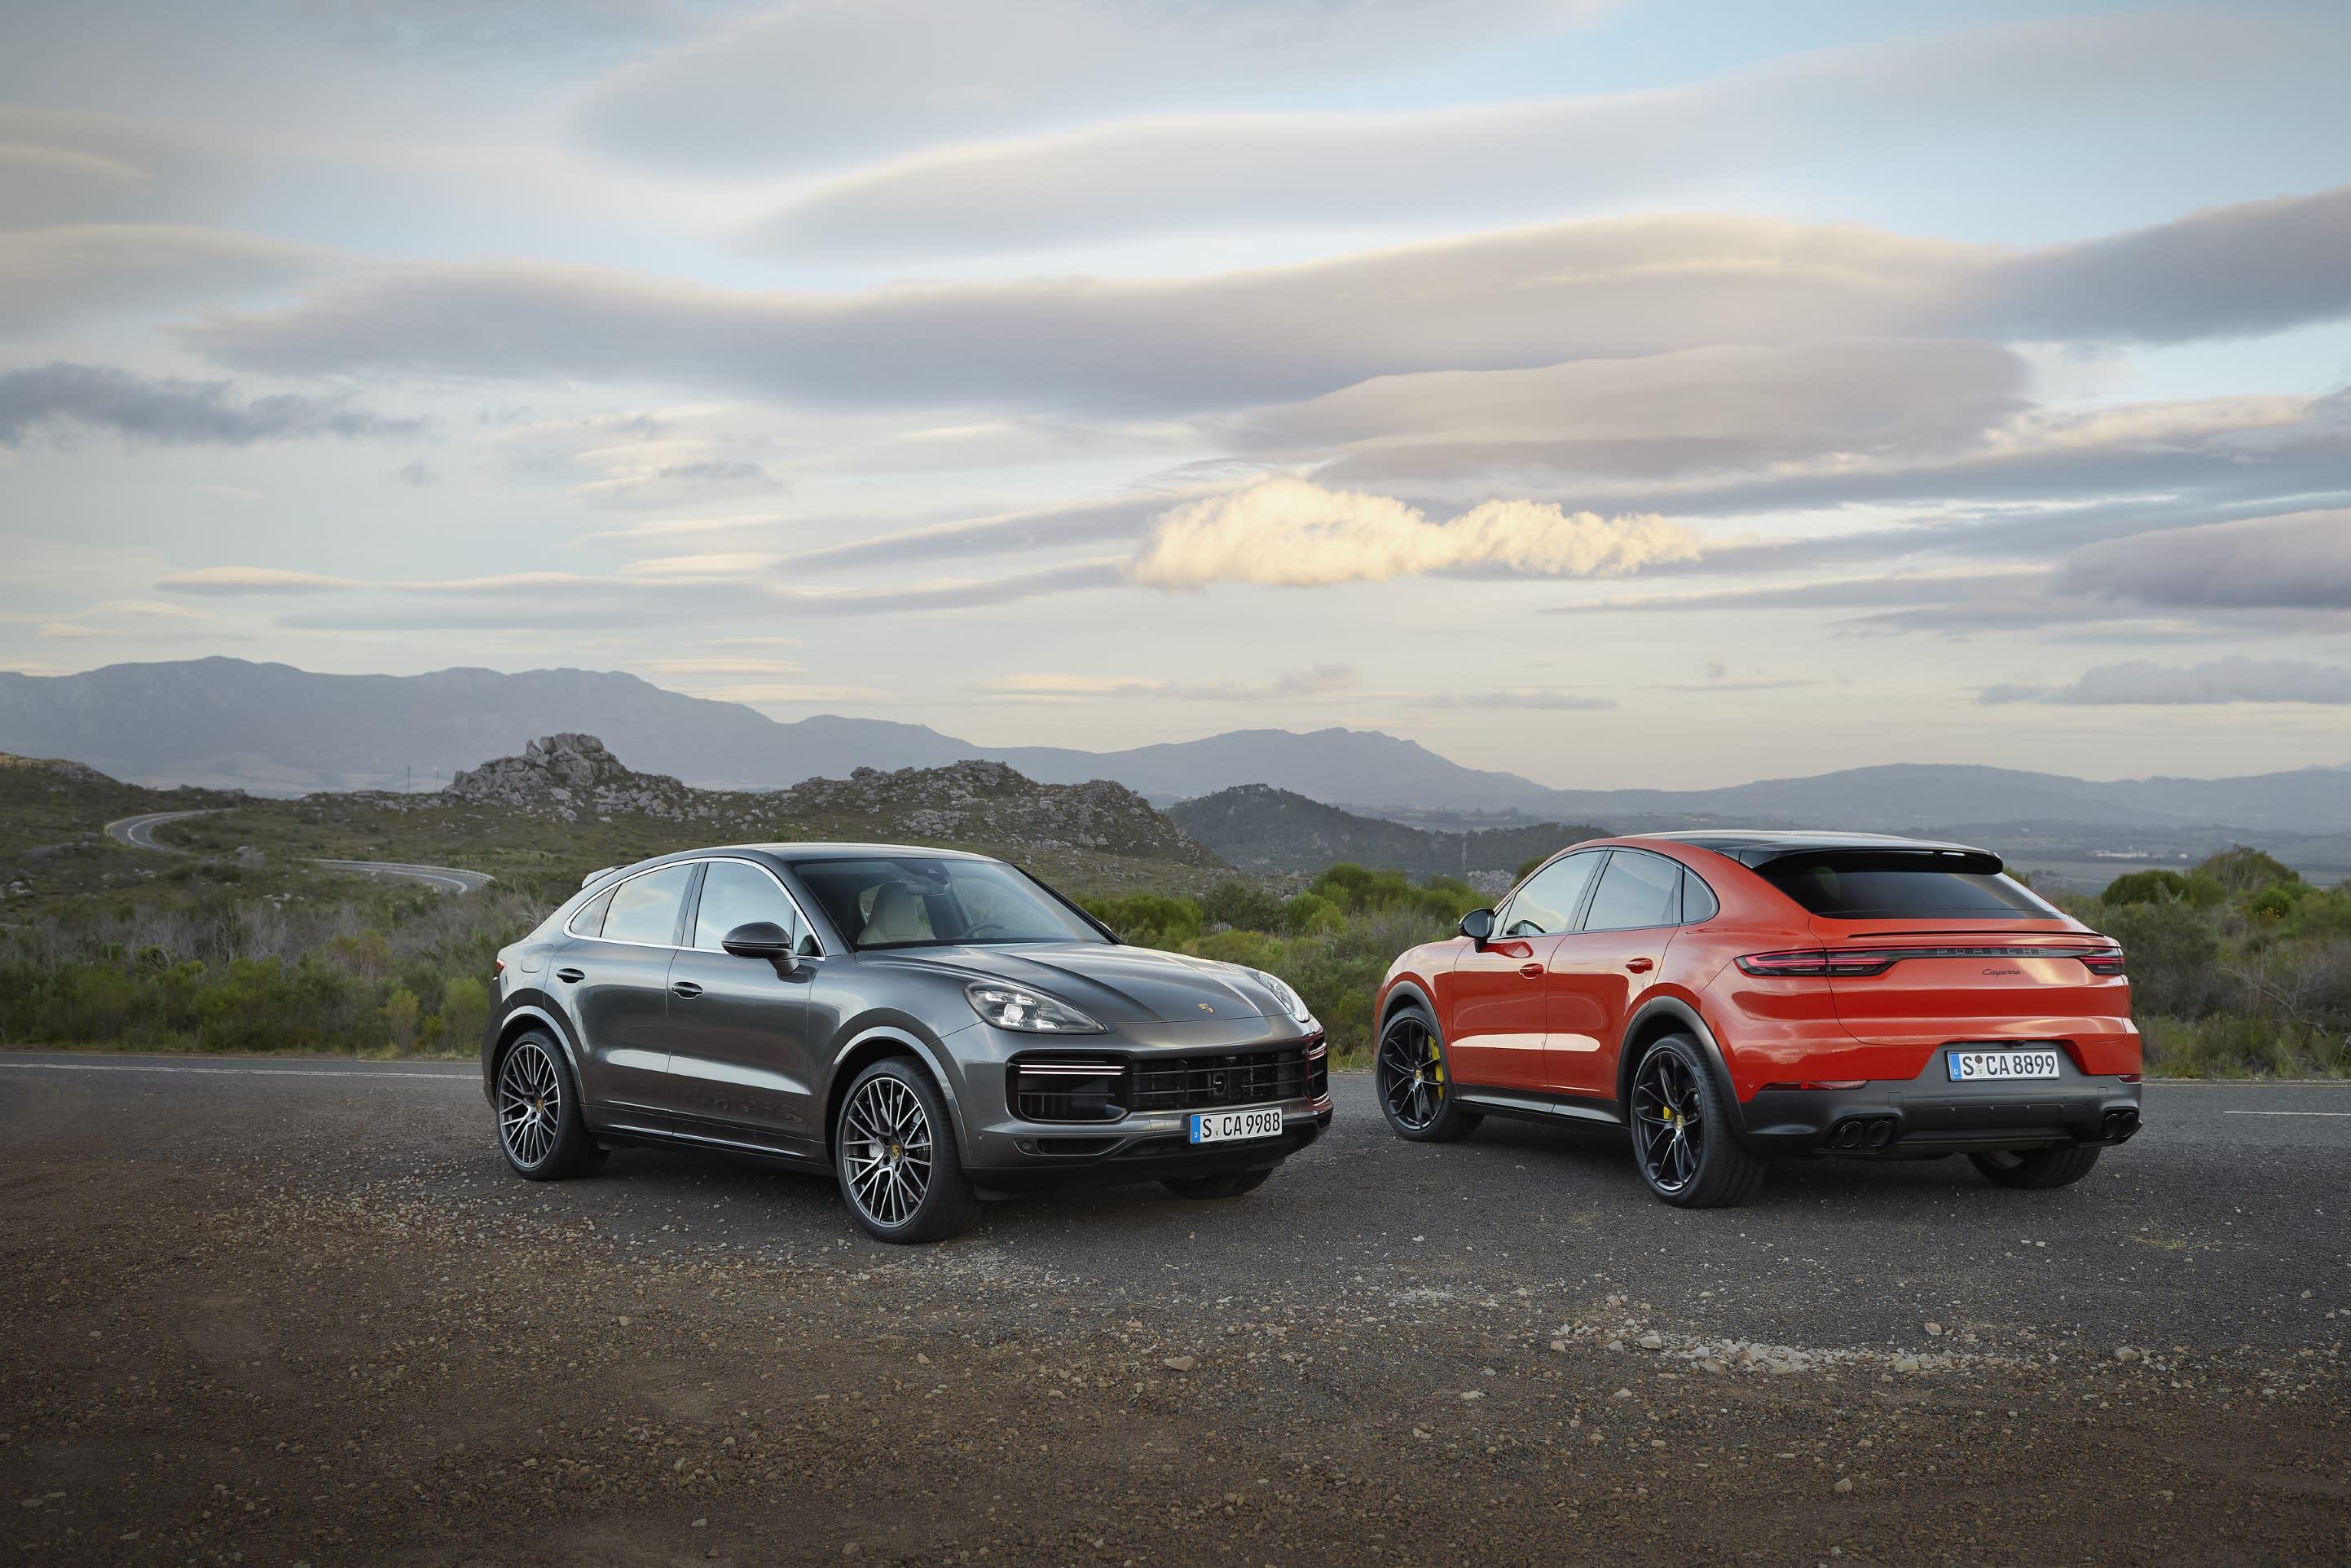 2020 Porsche Cayenne Coupe To Get Hybrid Trim In Near Future